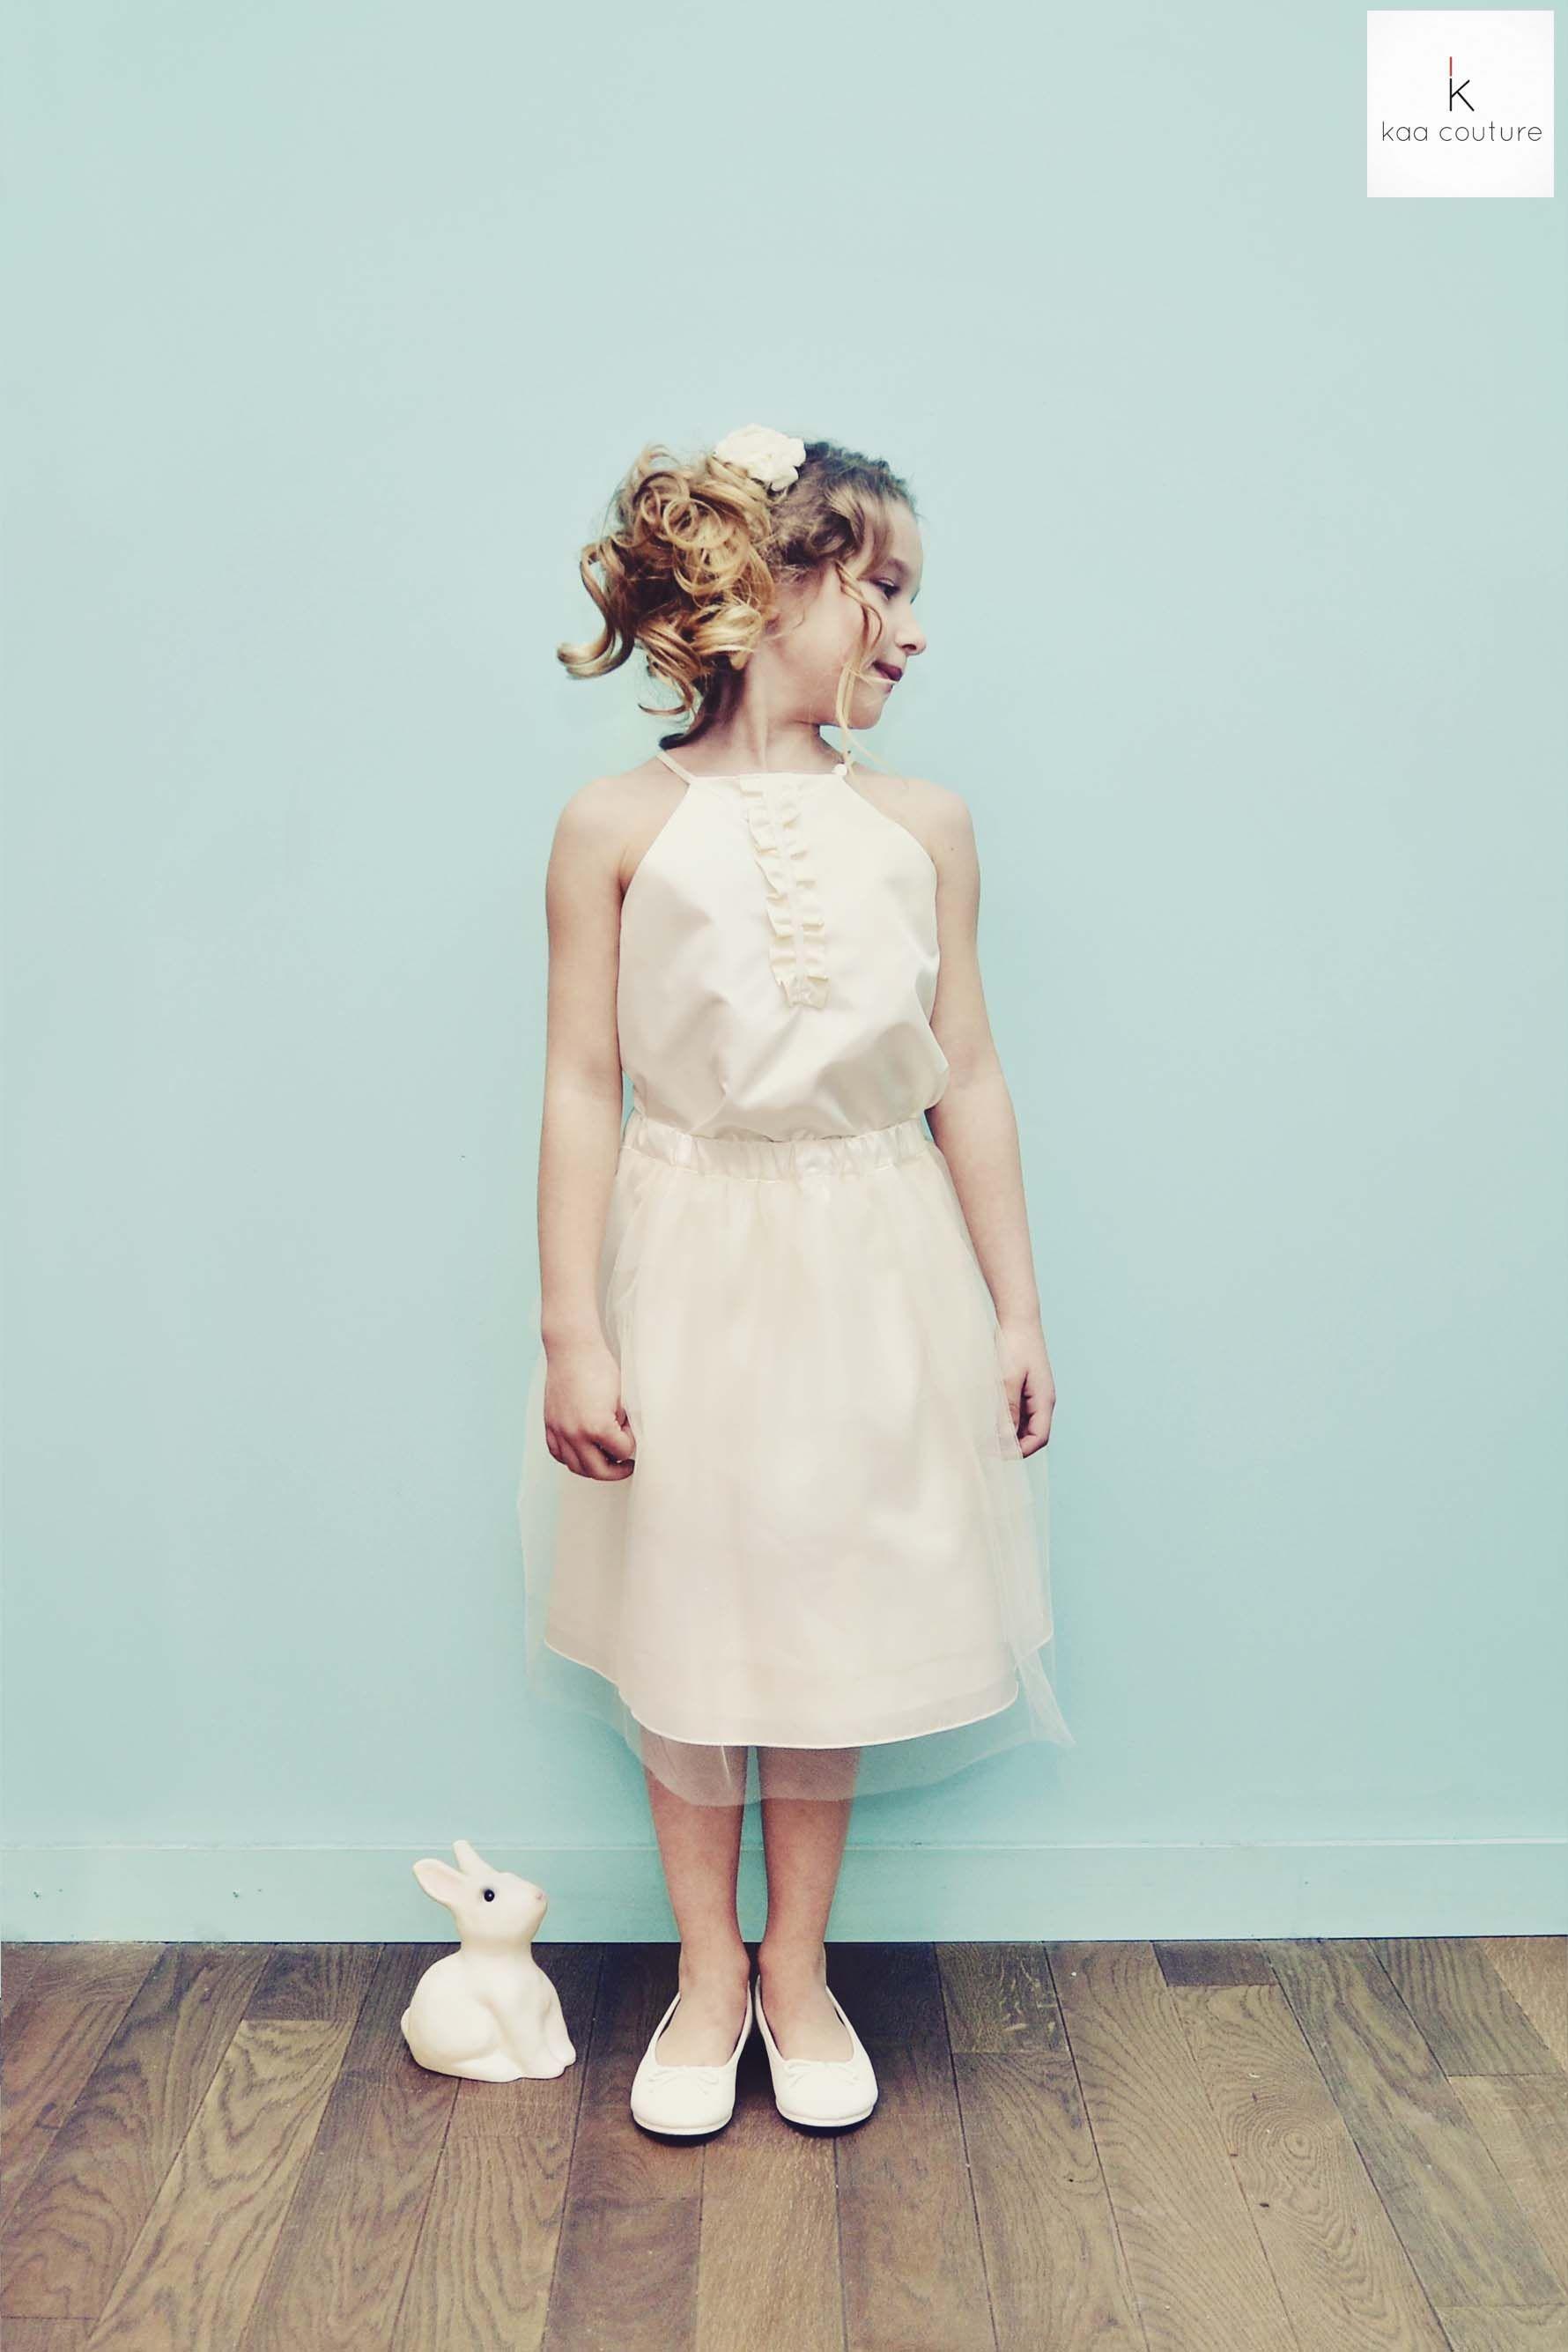 ... Kaa Couture Pro on kaa couture créatrice robe de mariée à lyon